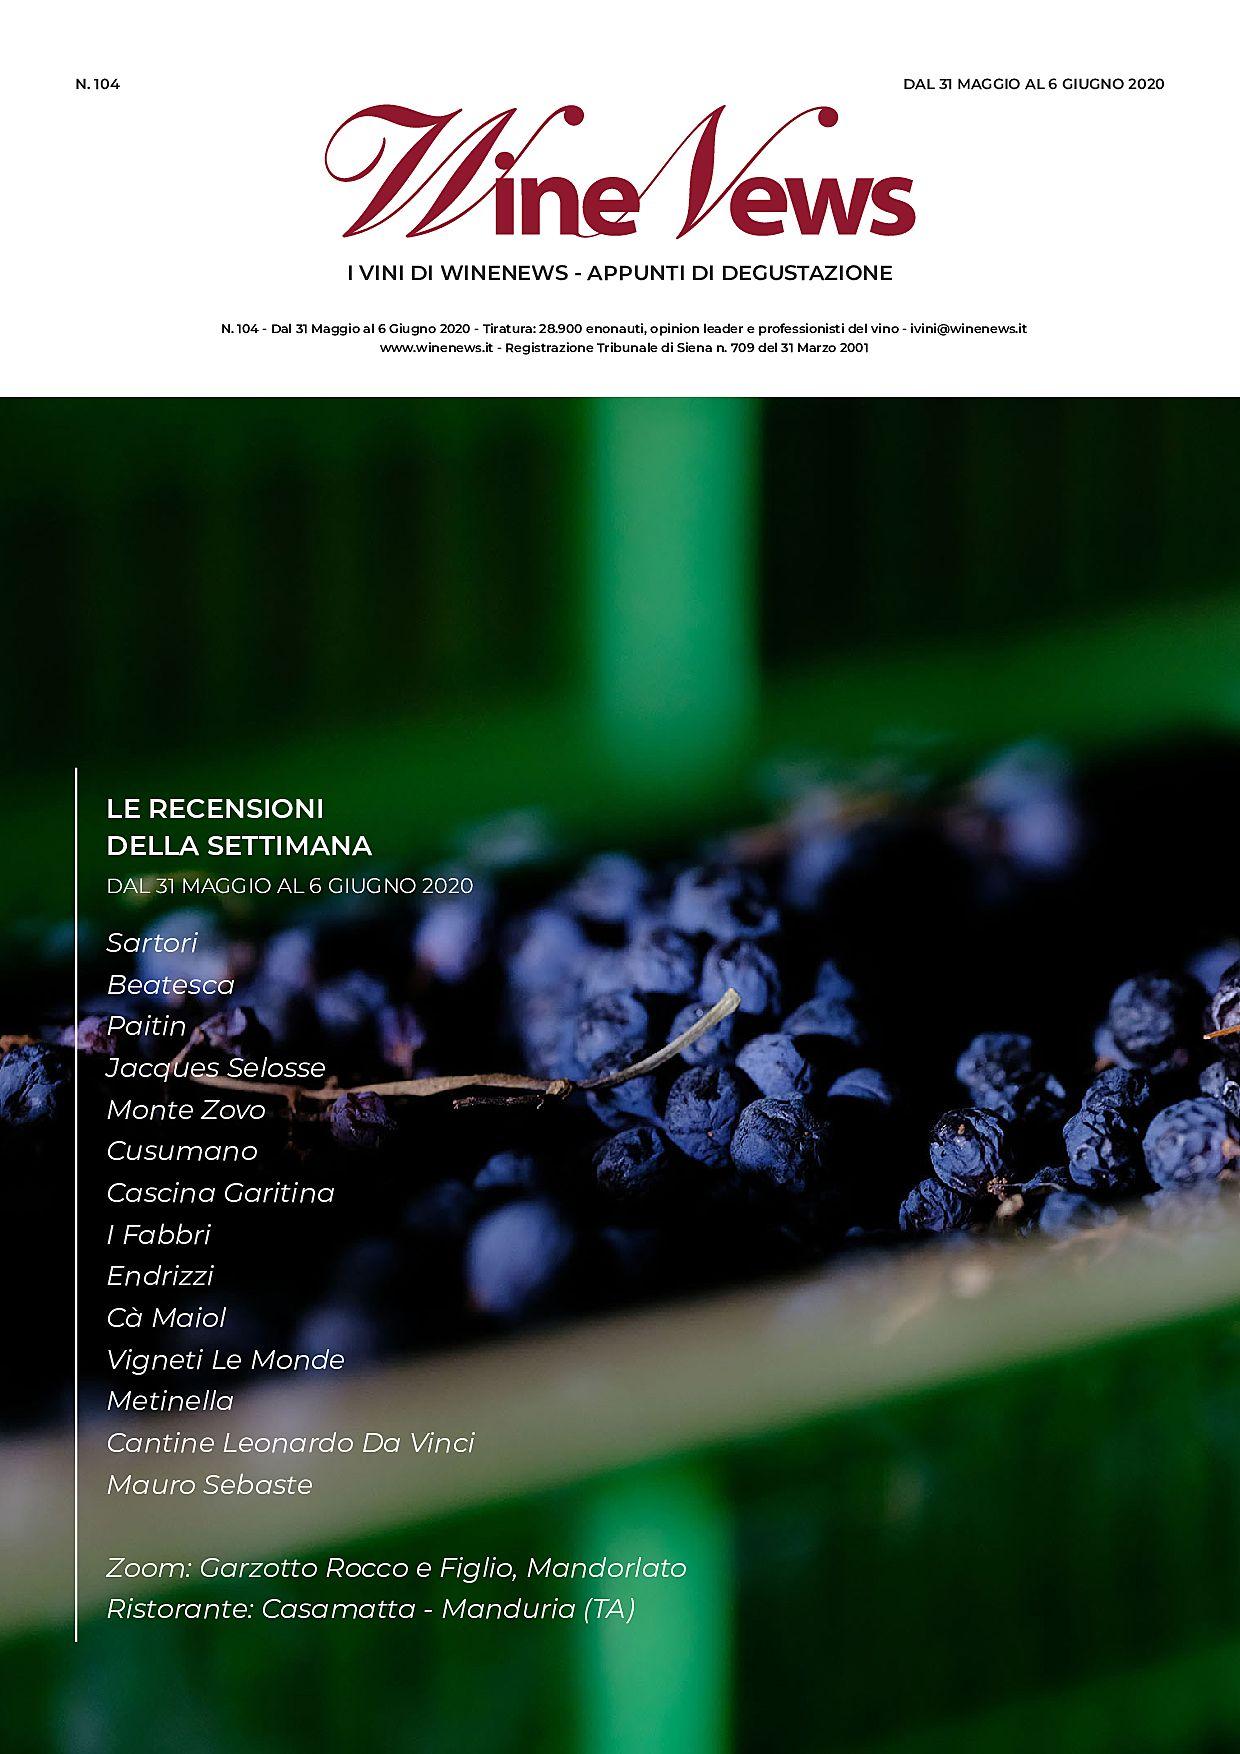 https://winenews.it/php/redirect_pdf.php?id=417880&t=1590769926